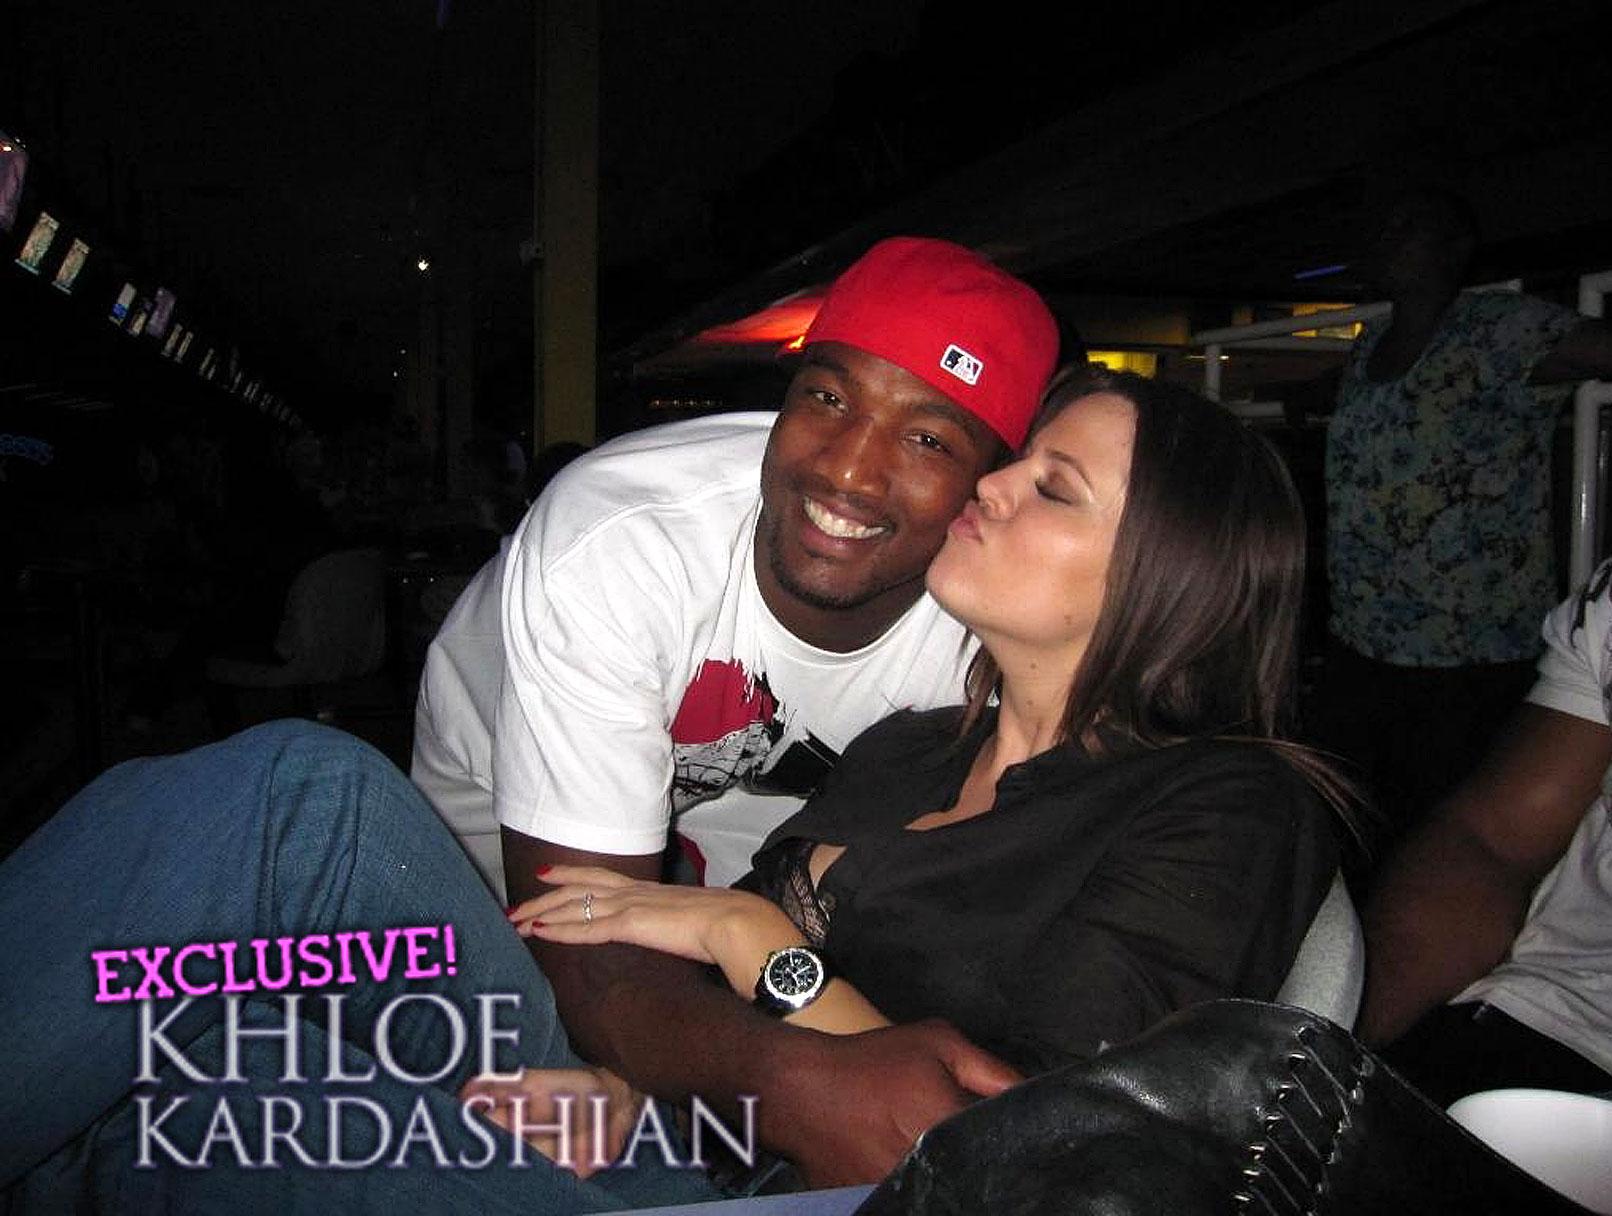 Khloe Kardashian: Totally Not Engaged!